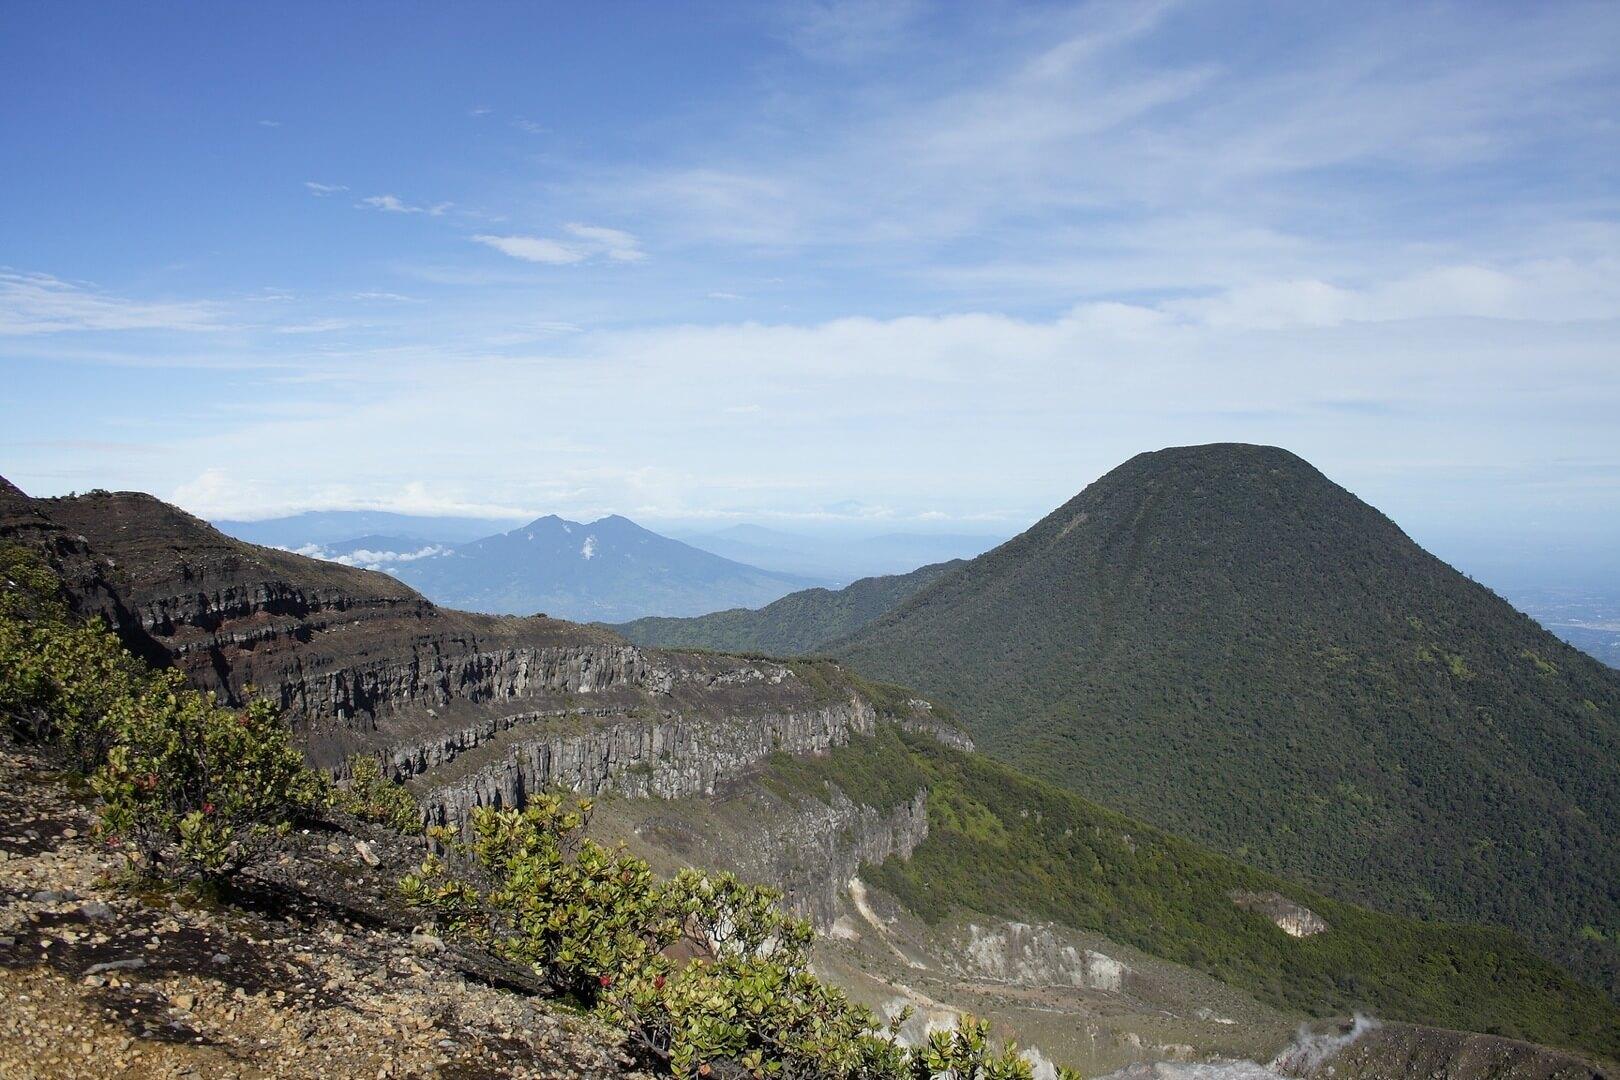 taman-nasional-gunung-gede-pangrango